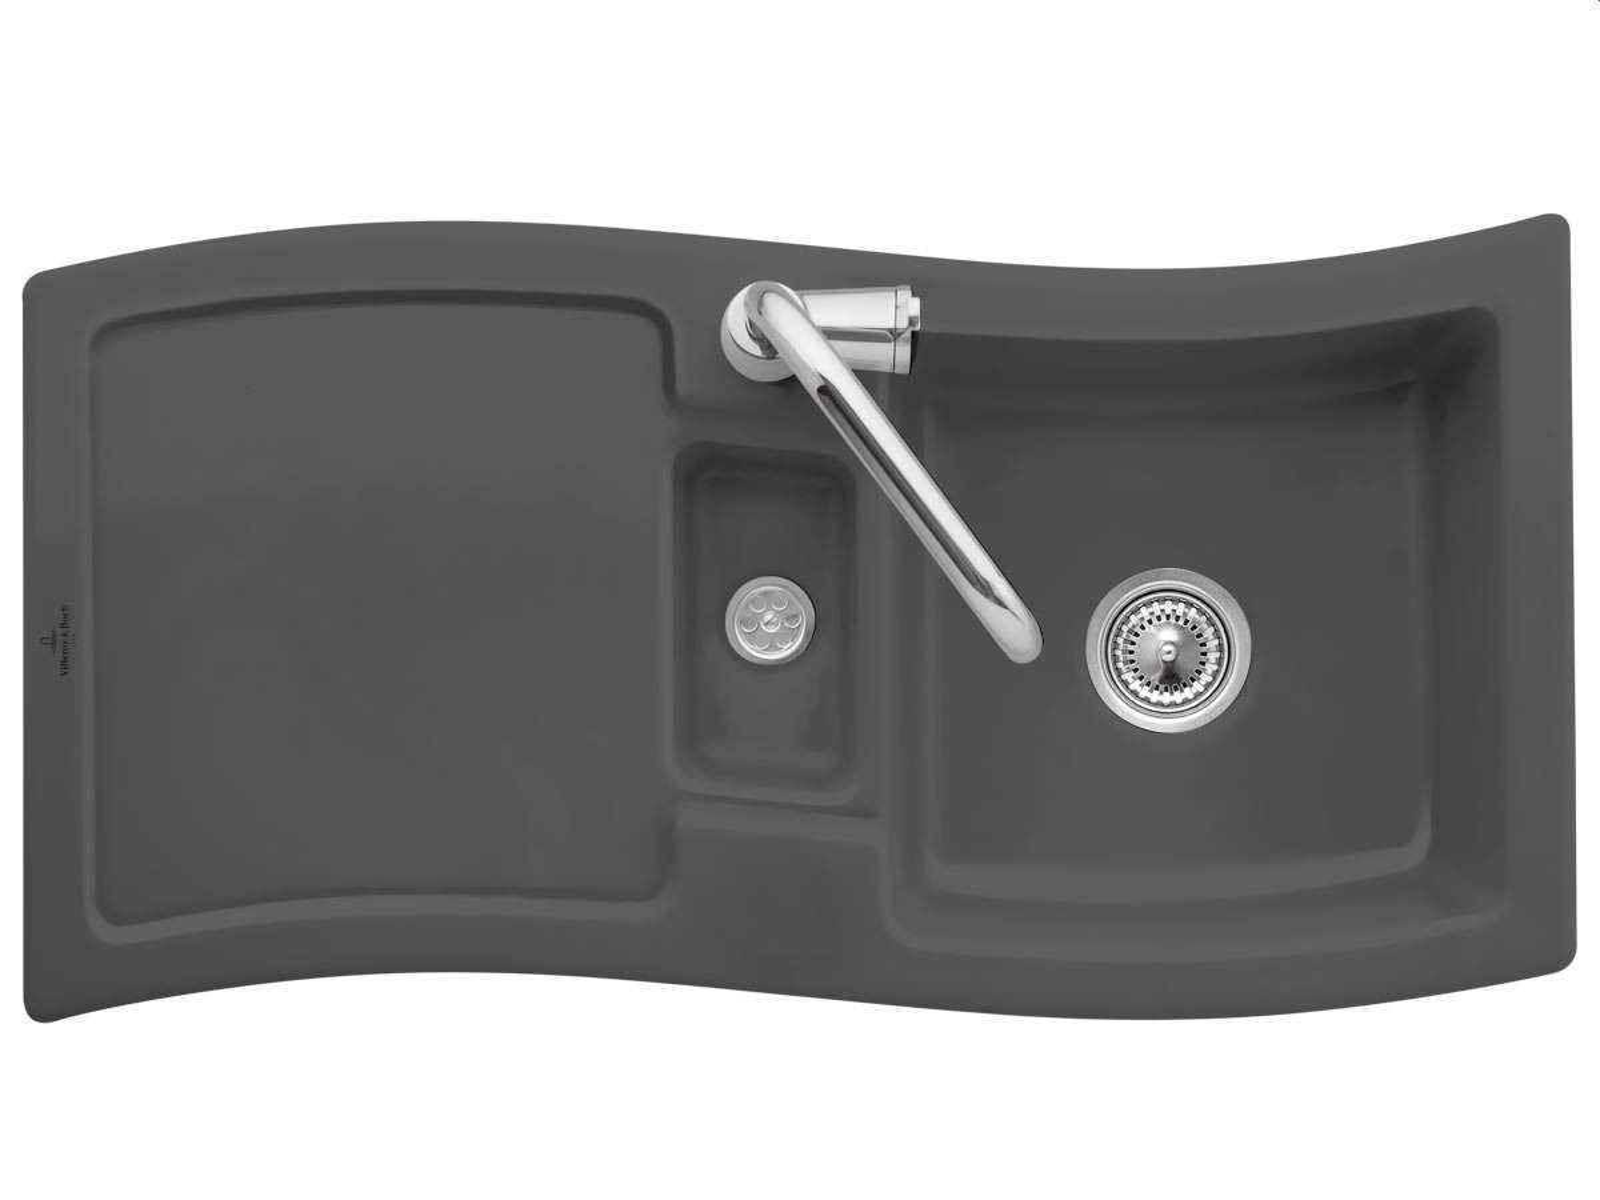 Villeroy & Boch NewWave 60 Graphit - 6716 01 i4 Keramikspüle Handbetätigung